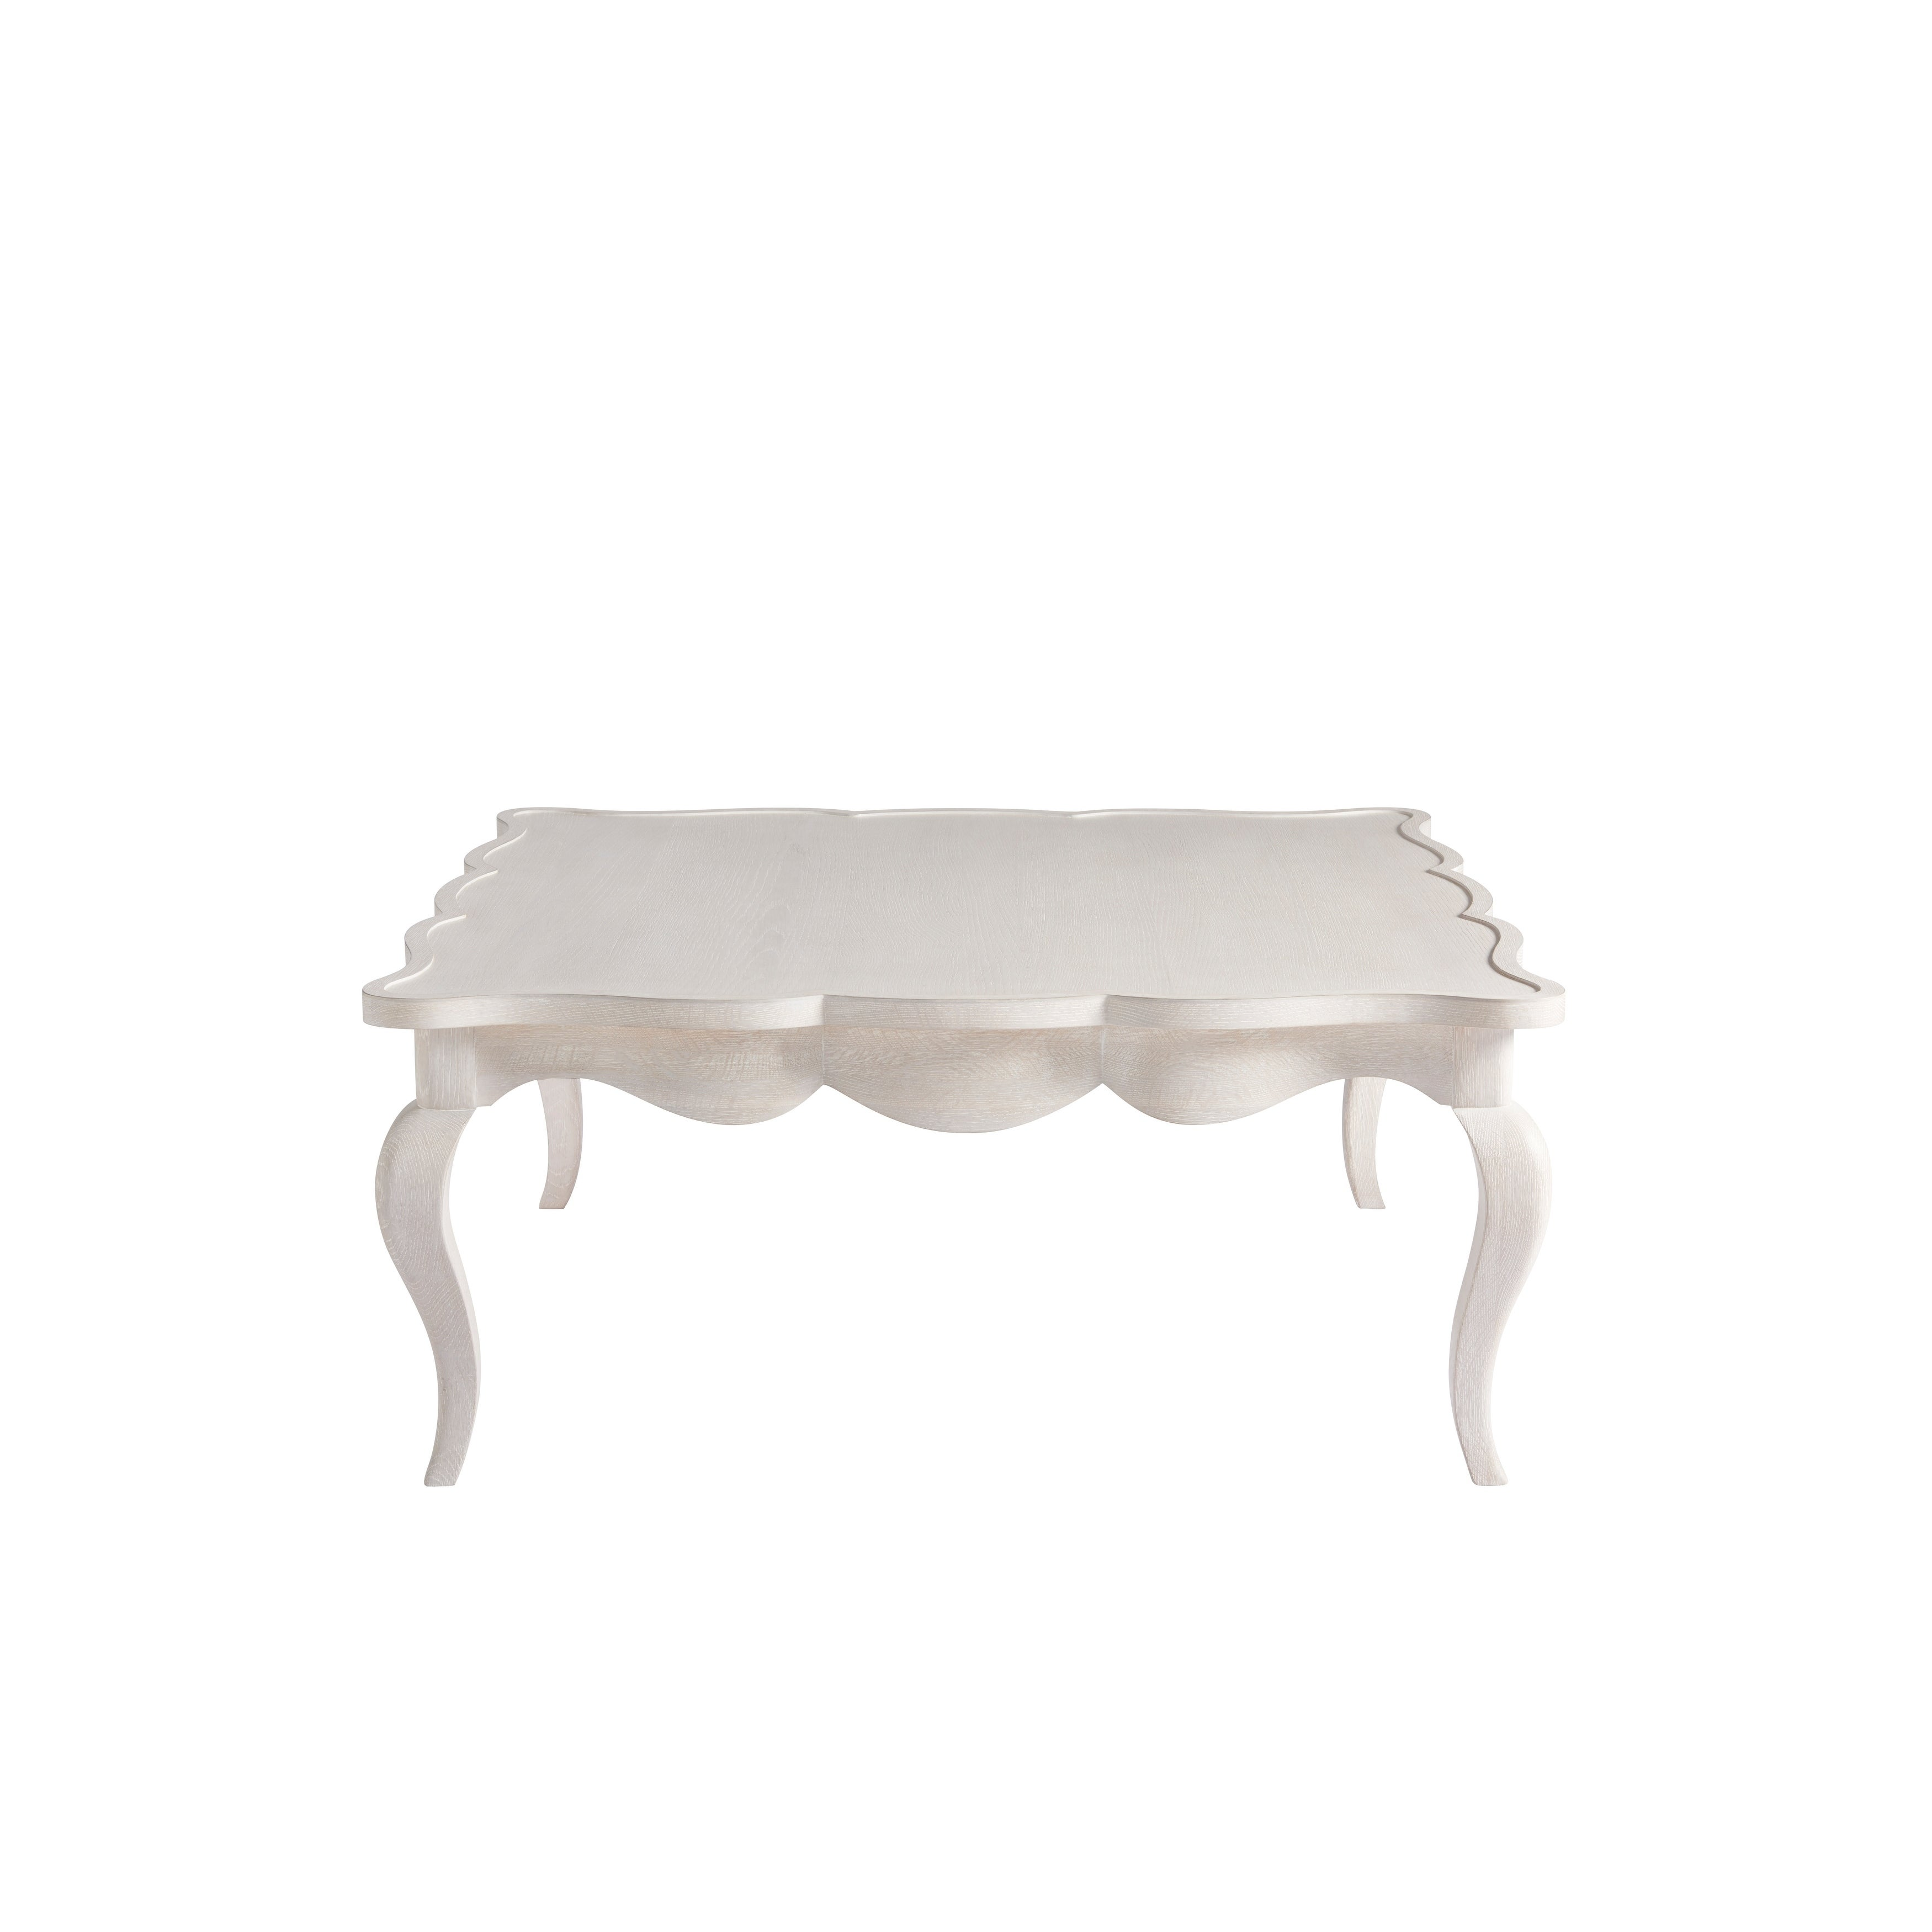 Universal Furniture Paula Deen Bungalow Bluff Off-white (...